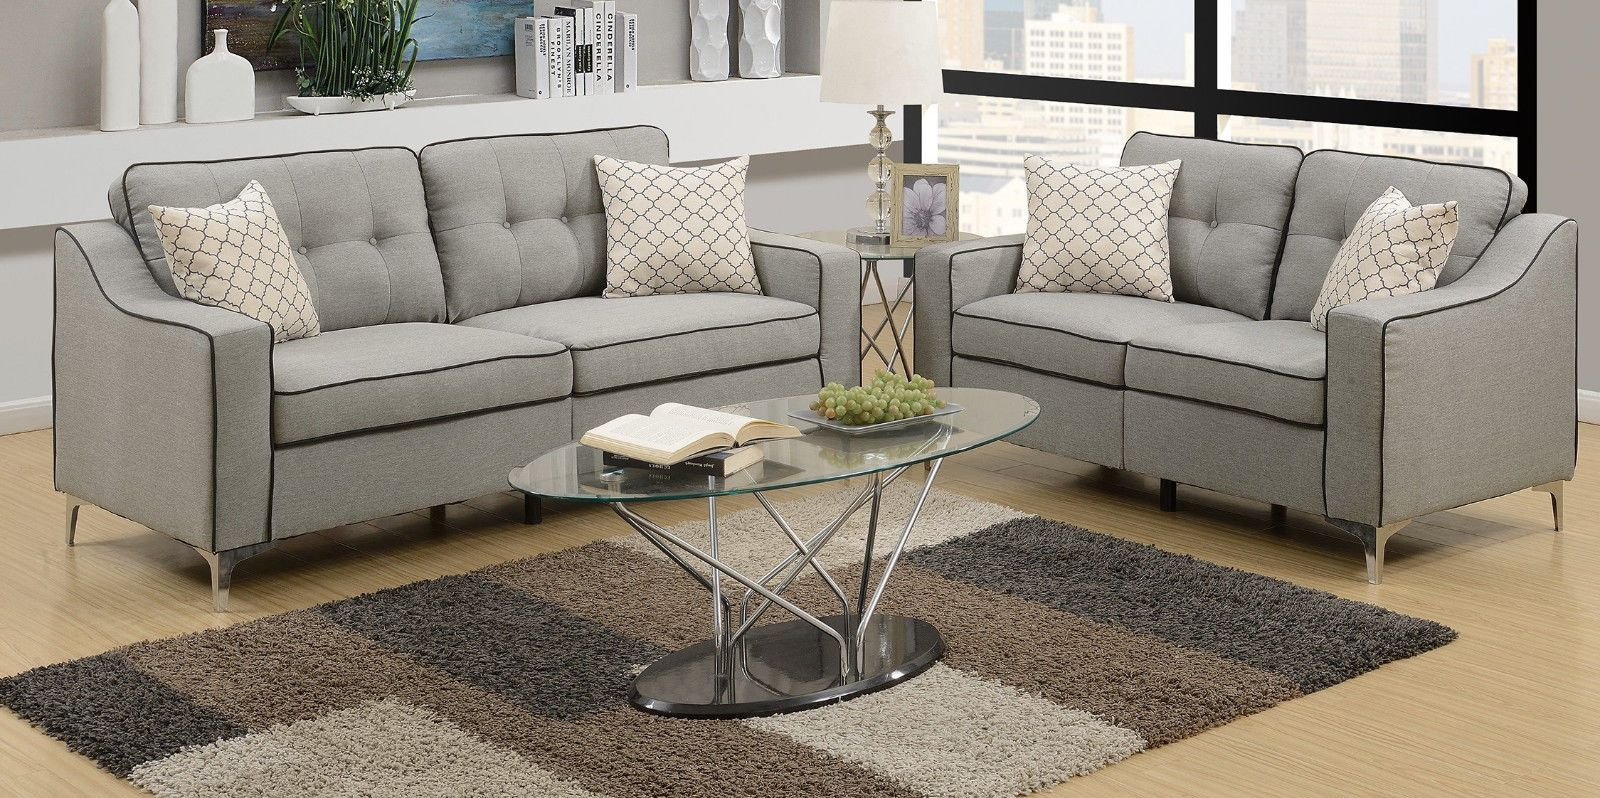 749 99 Light Grey Sofa Loveseat Black Border Linen Fabric Tufted